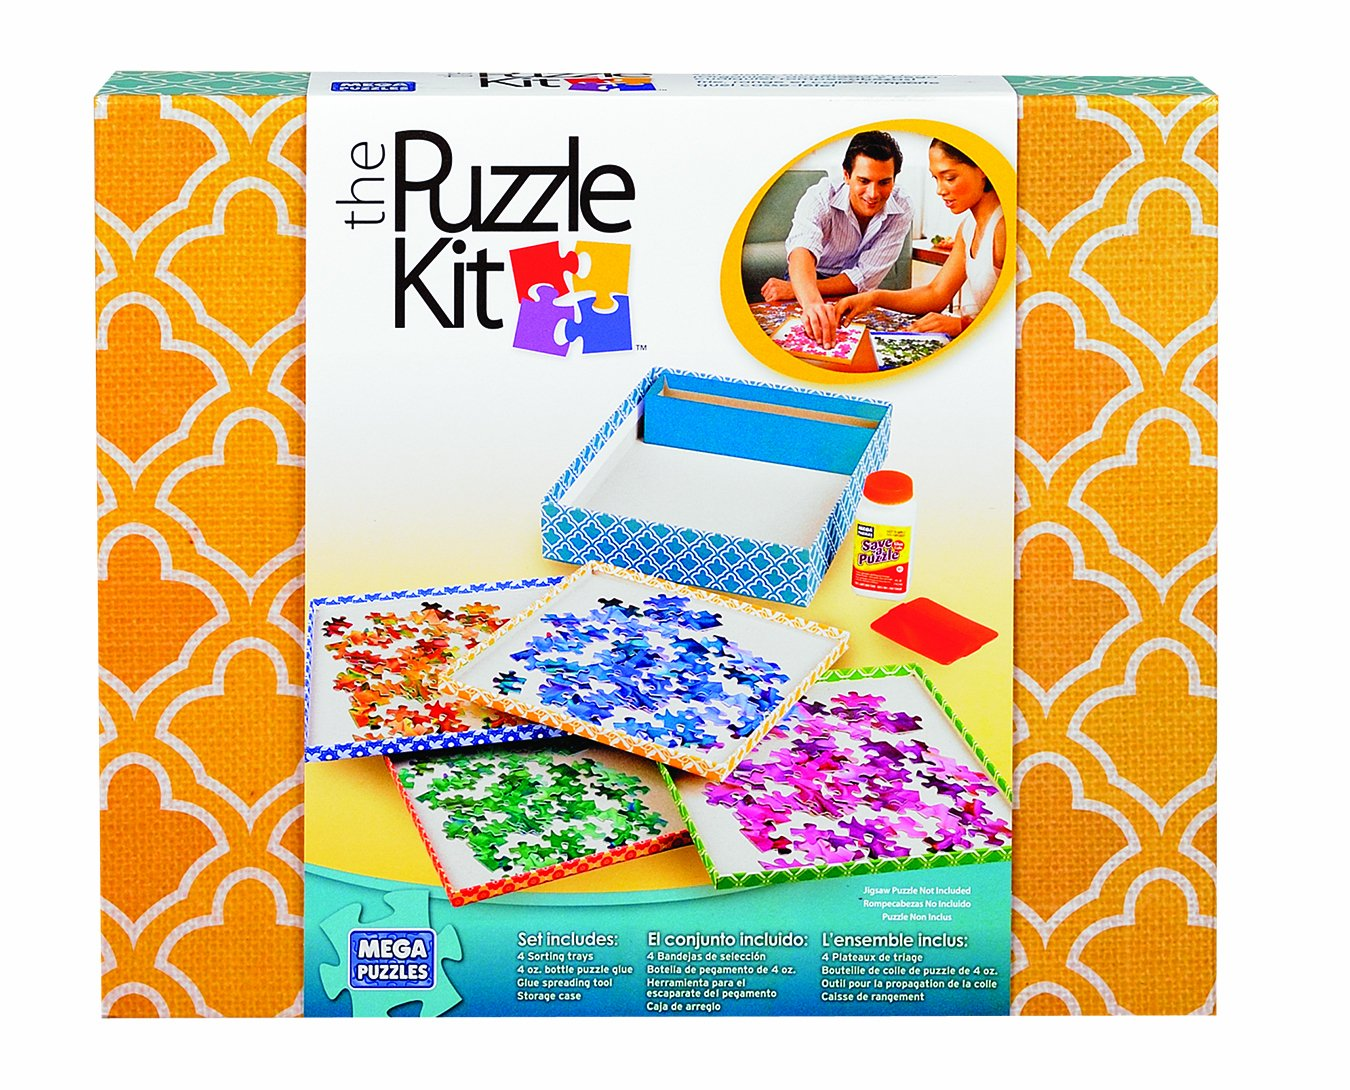 Mega Puzzles The Puzzle Kit by Mega Puzzles